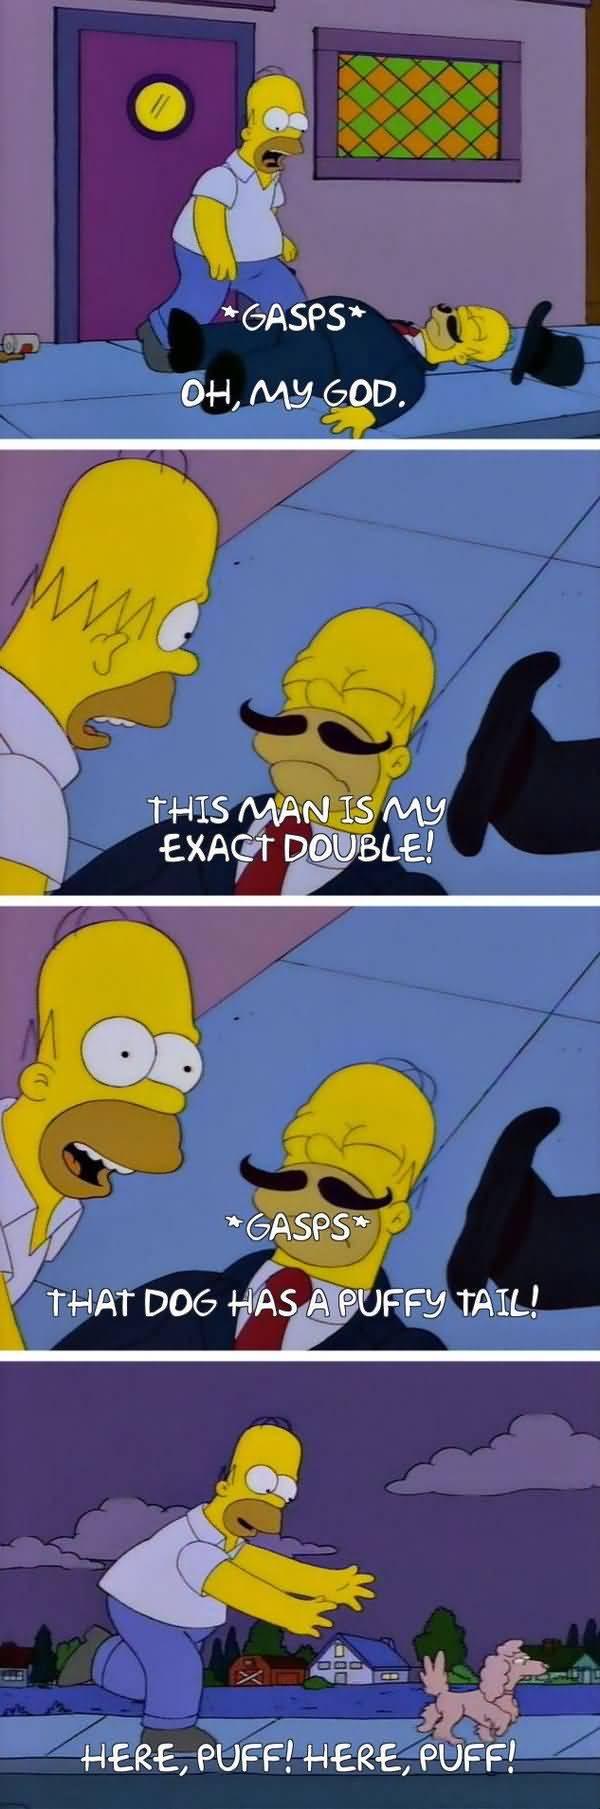 Funniest fun homer simpson salivating meme image